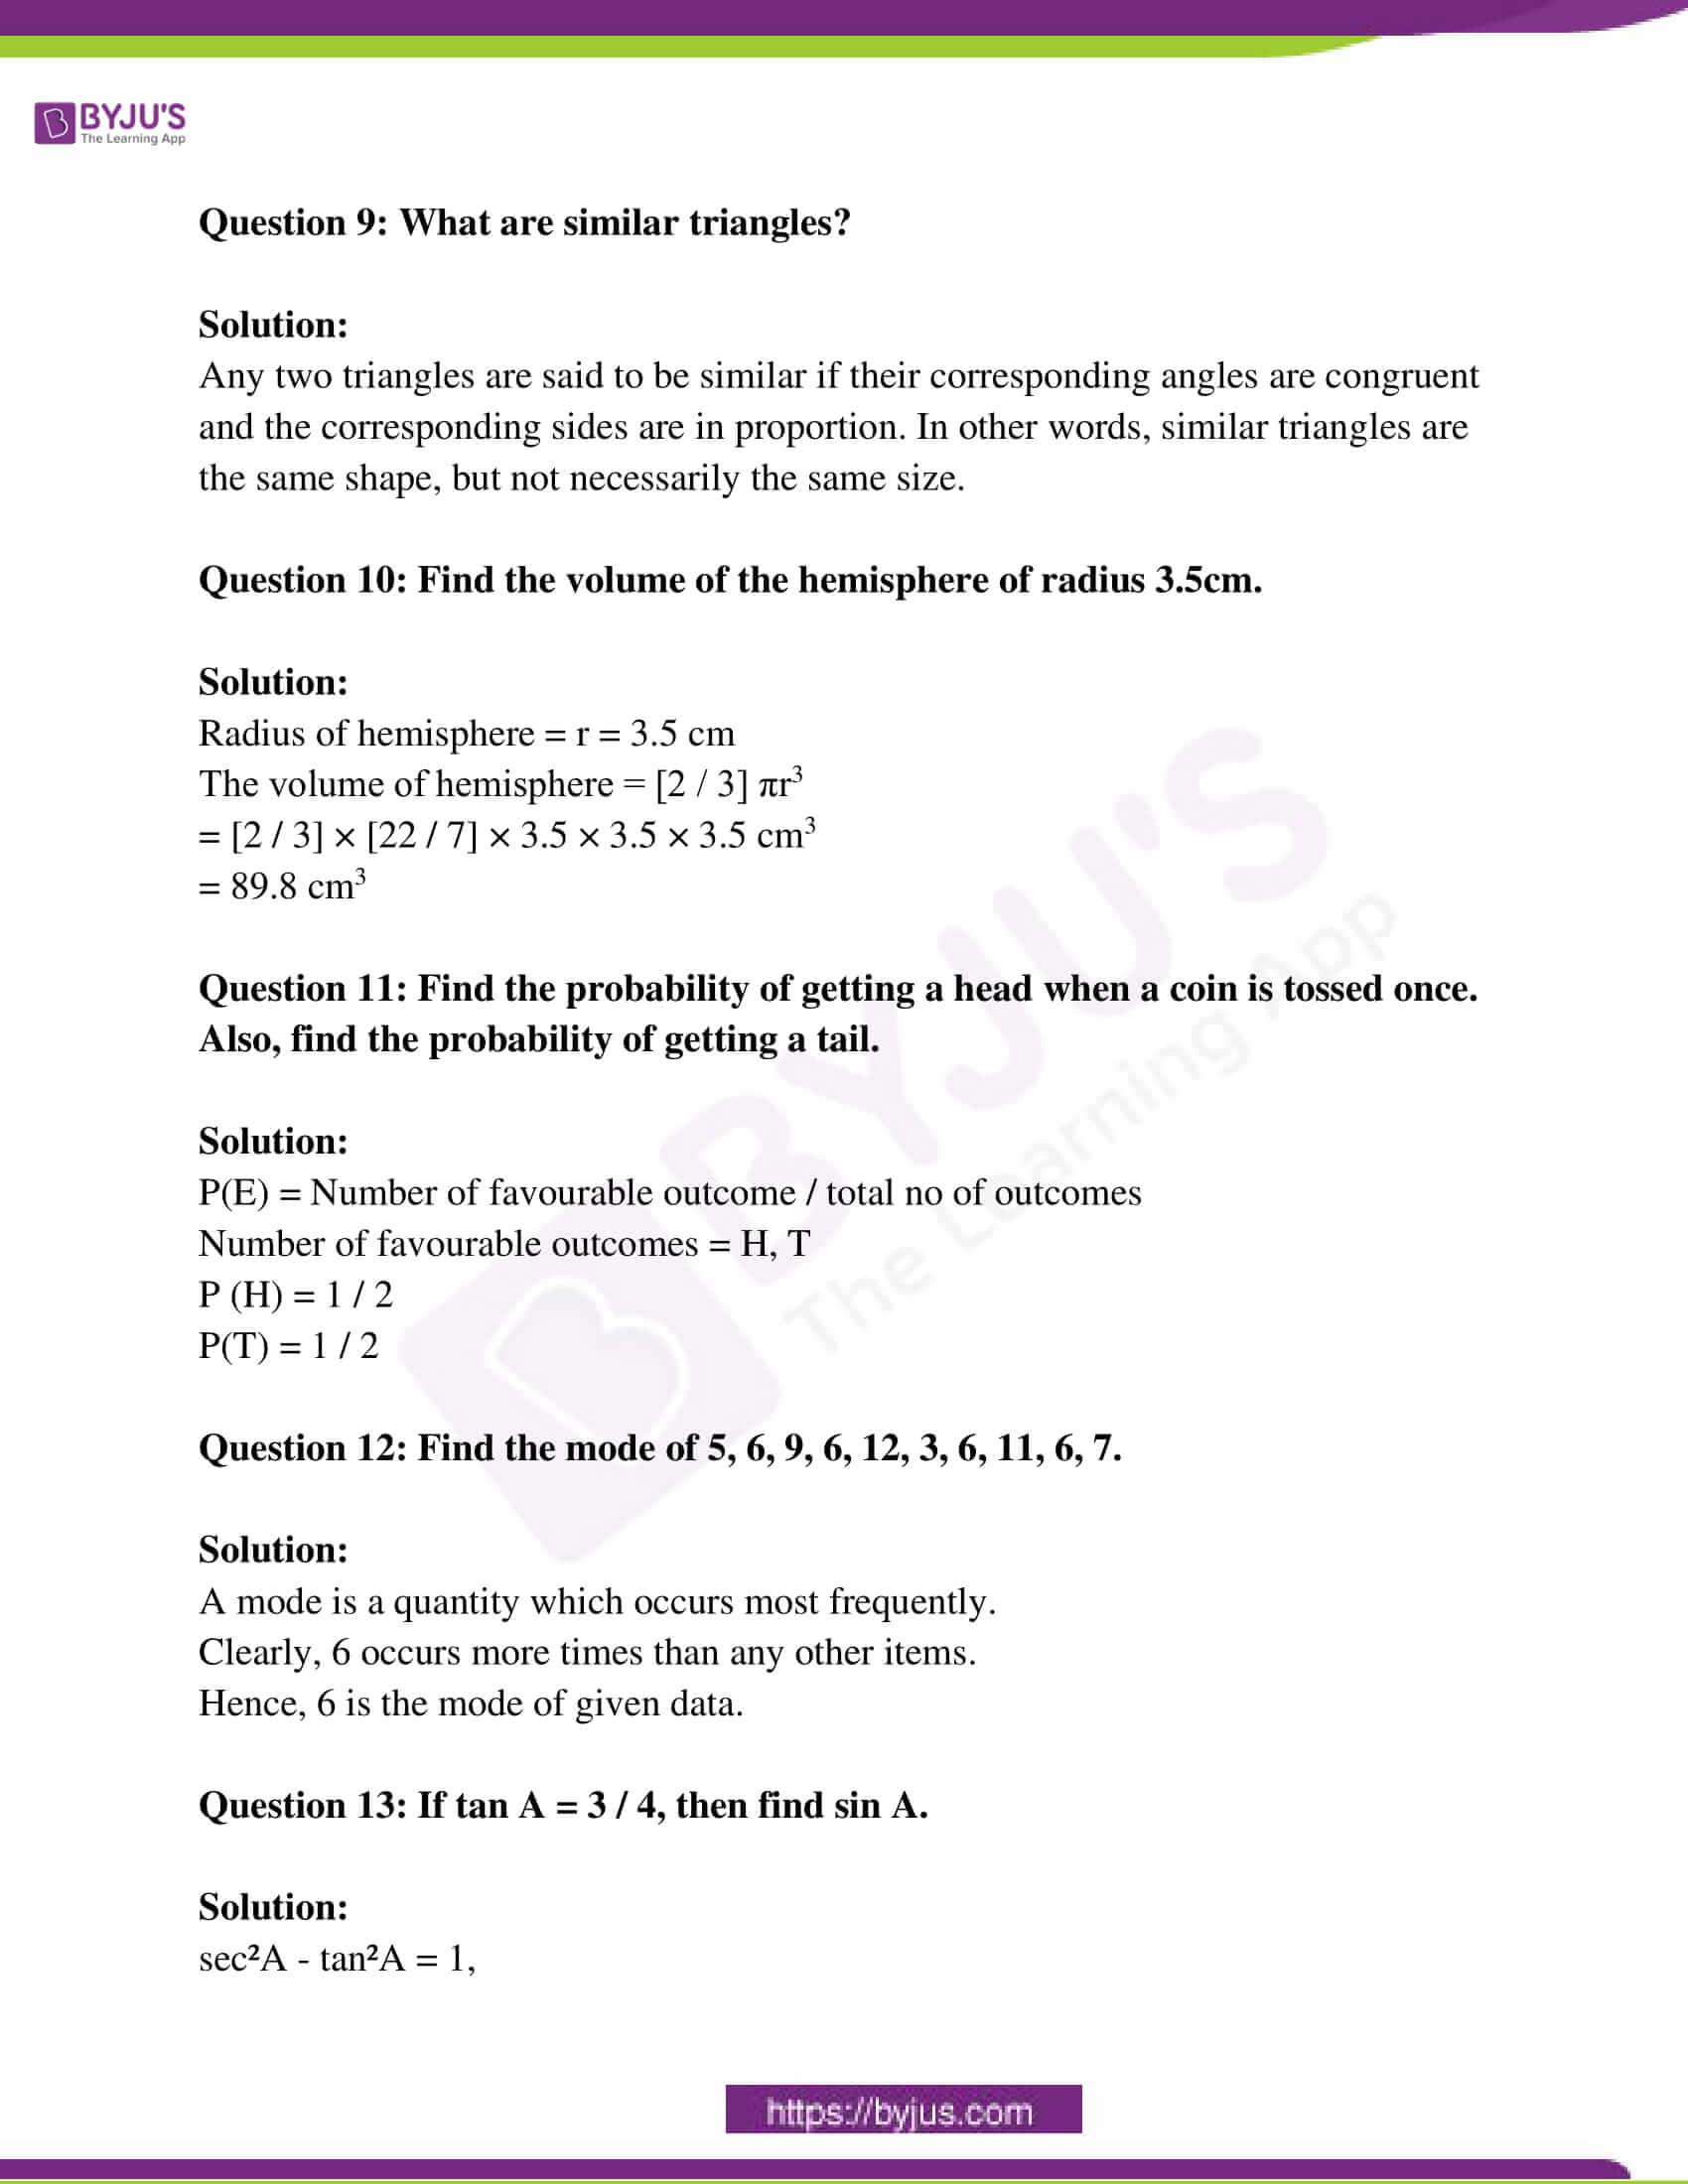 ap class 10 maths question paper 2 sol march 2016 05